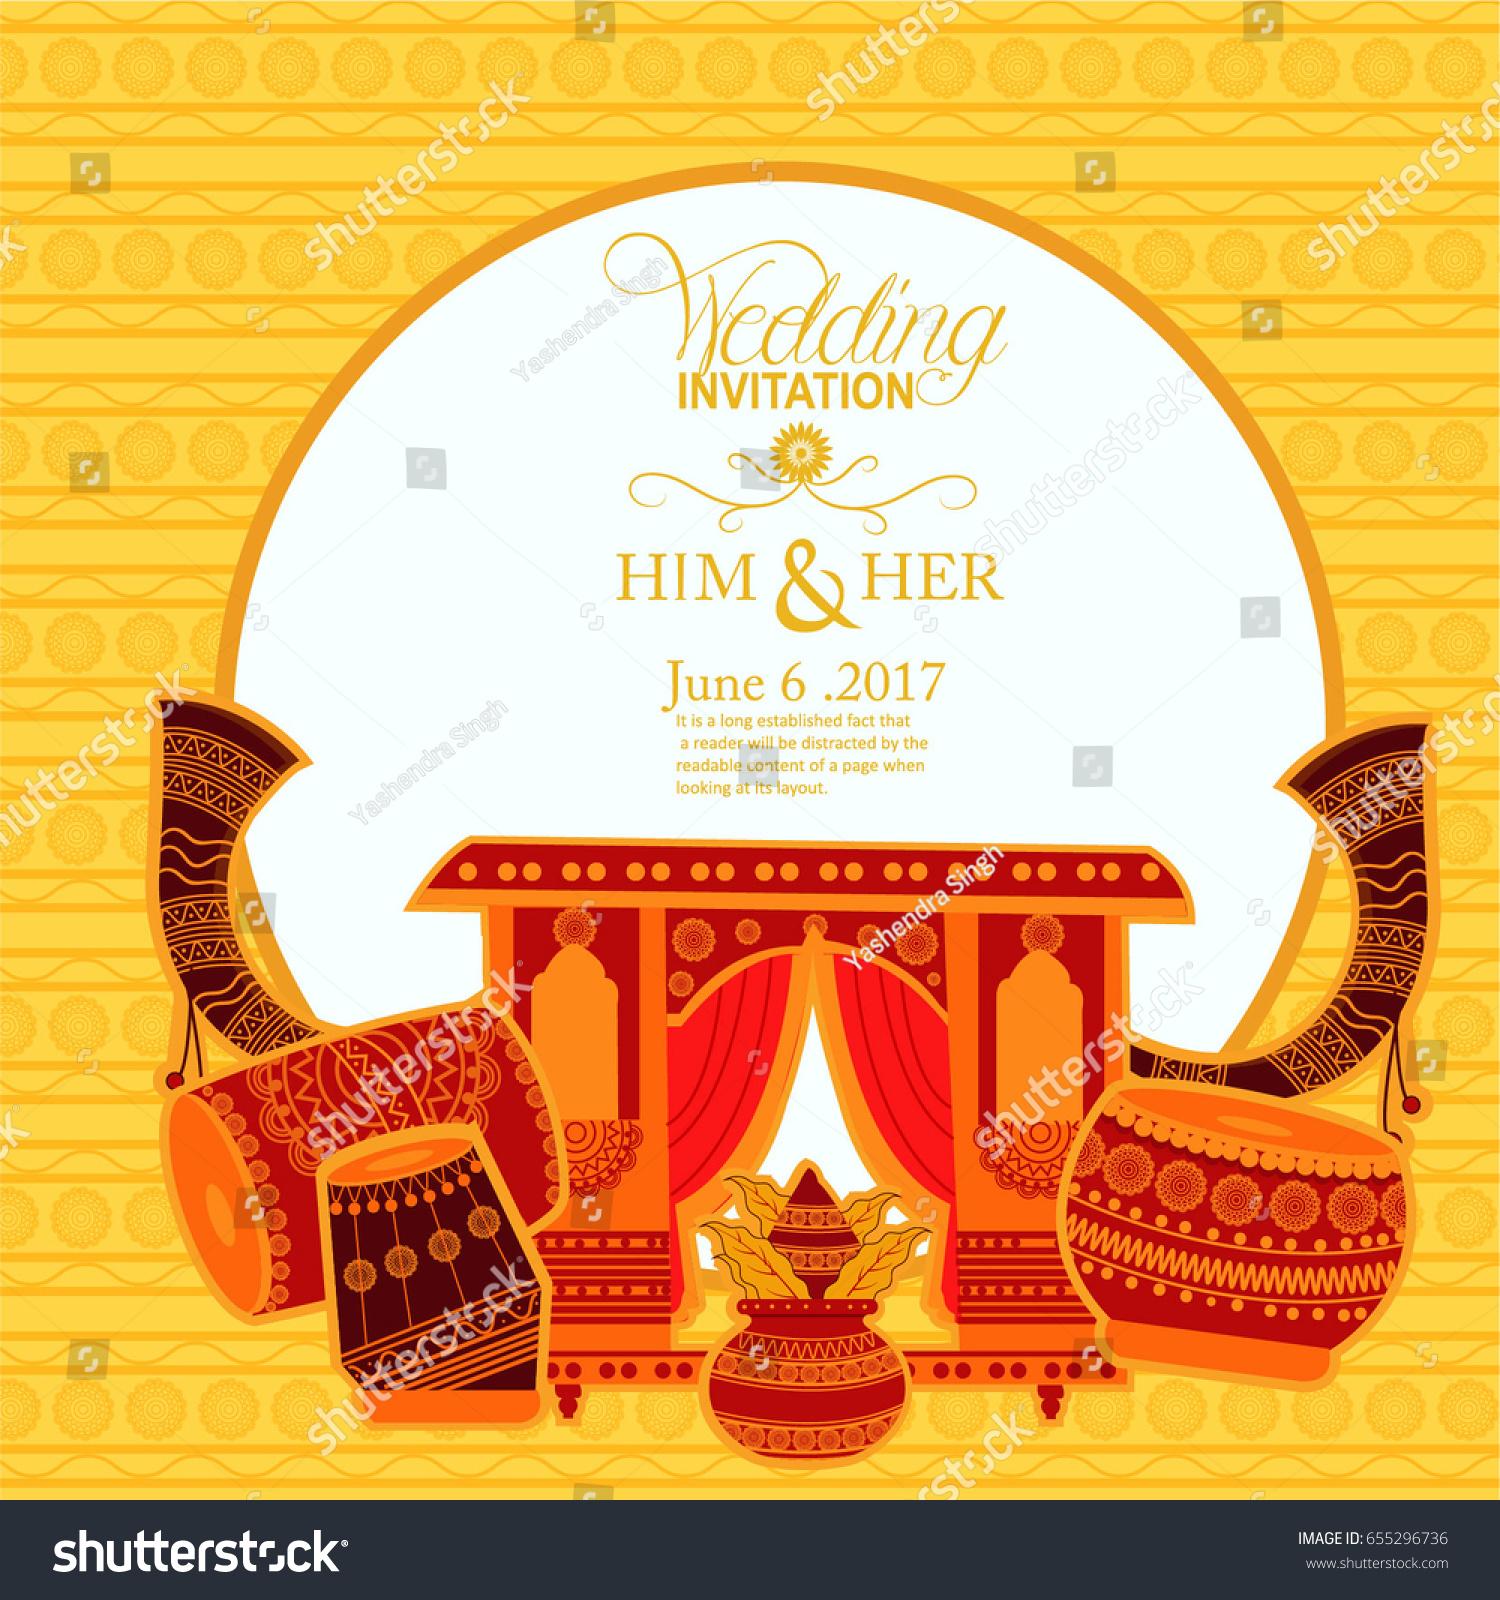 Wedding Invitation Card Stock Vector (Royalty Free) 655296736 ...